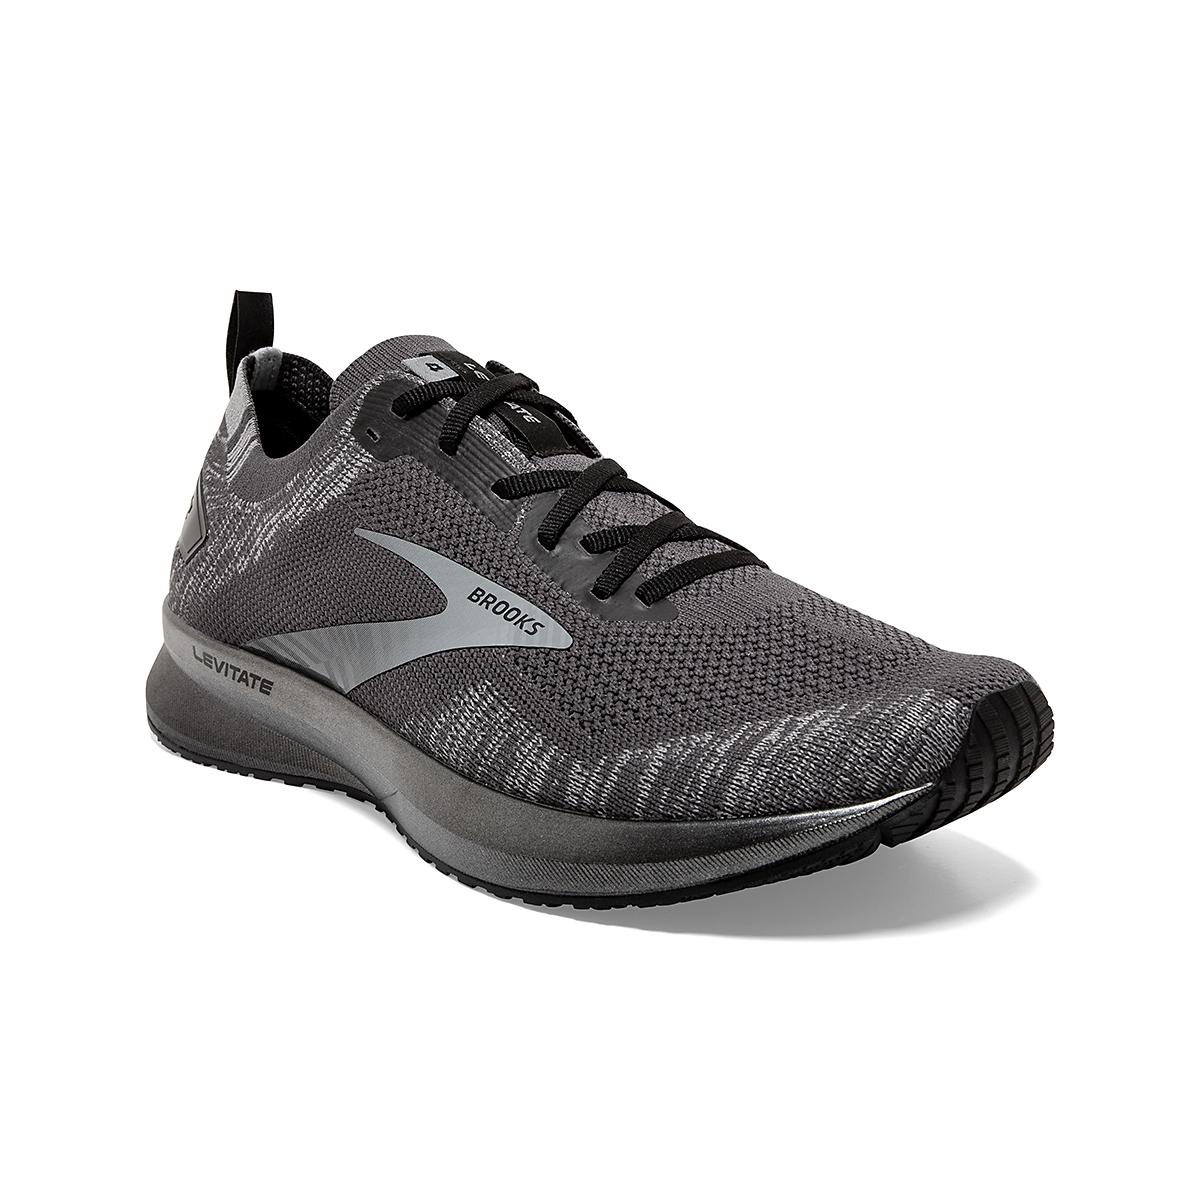 Men's Brooks Levitate 4 Running Shoe - Color: Blackened Pearl/Grey/Black - Size: 8 - Width: Regular, Blackened Pearl/Grey/Black, large, image 2